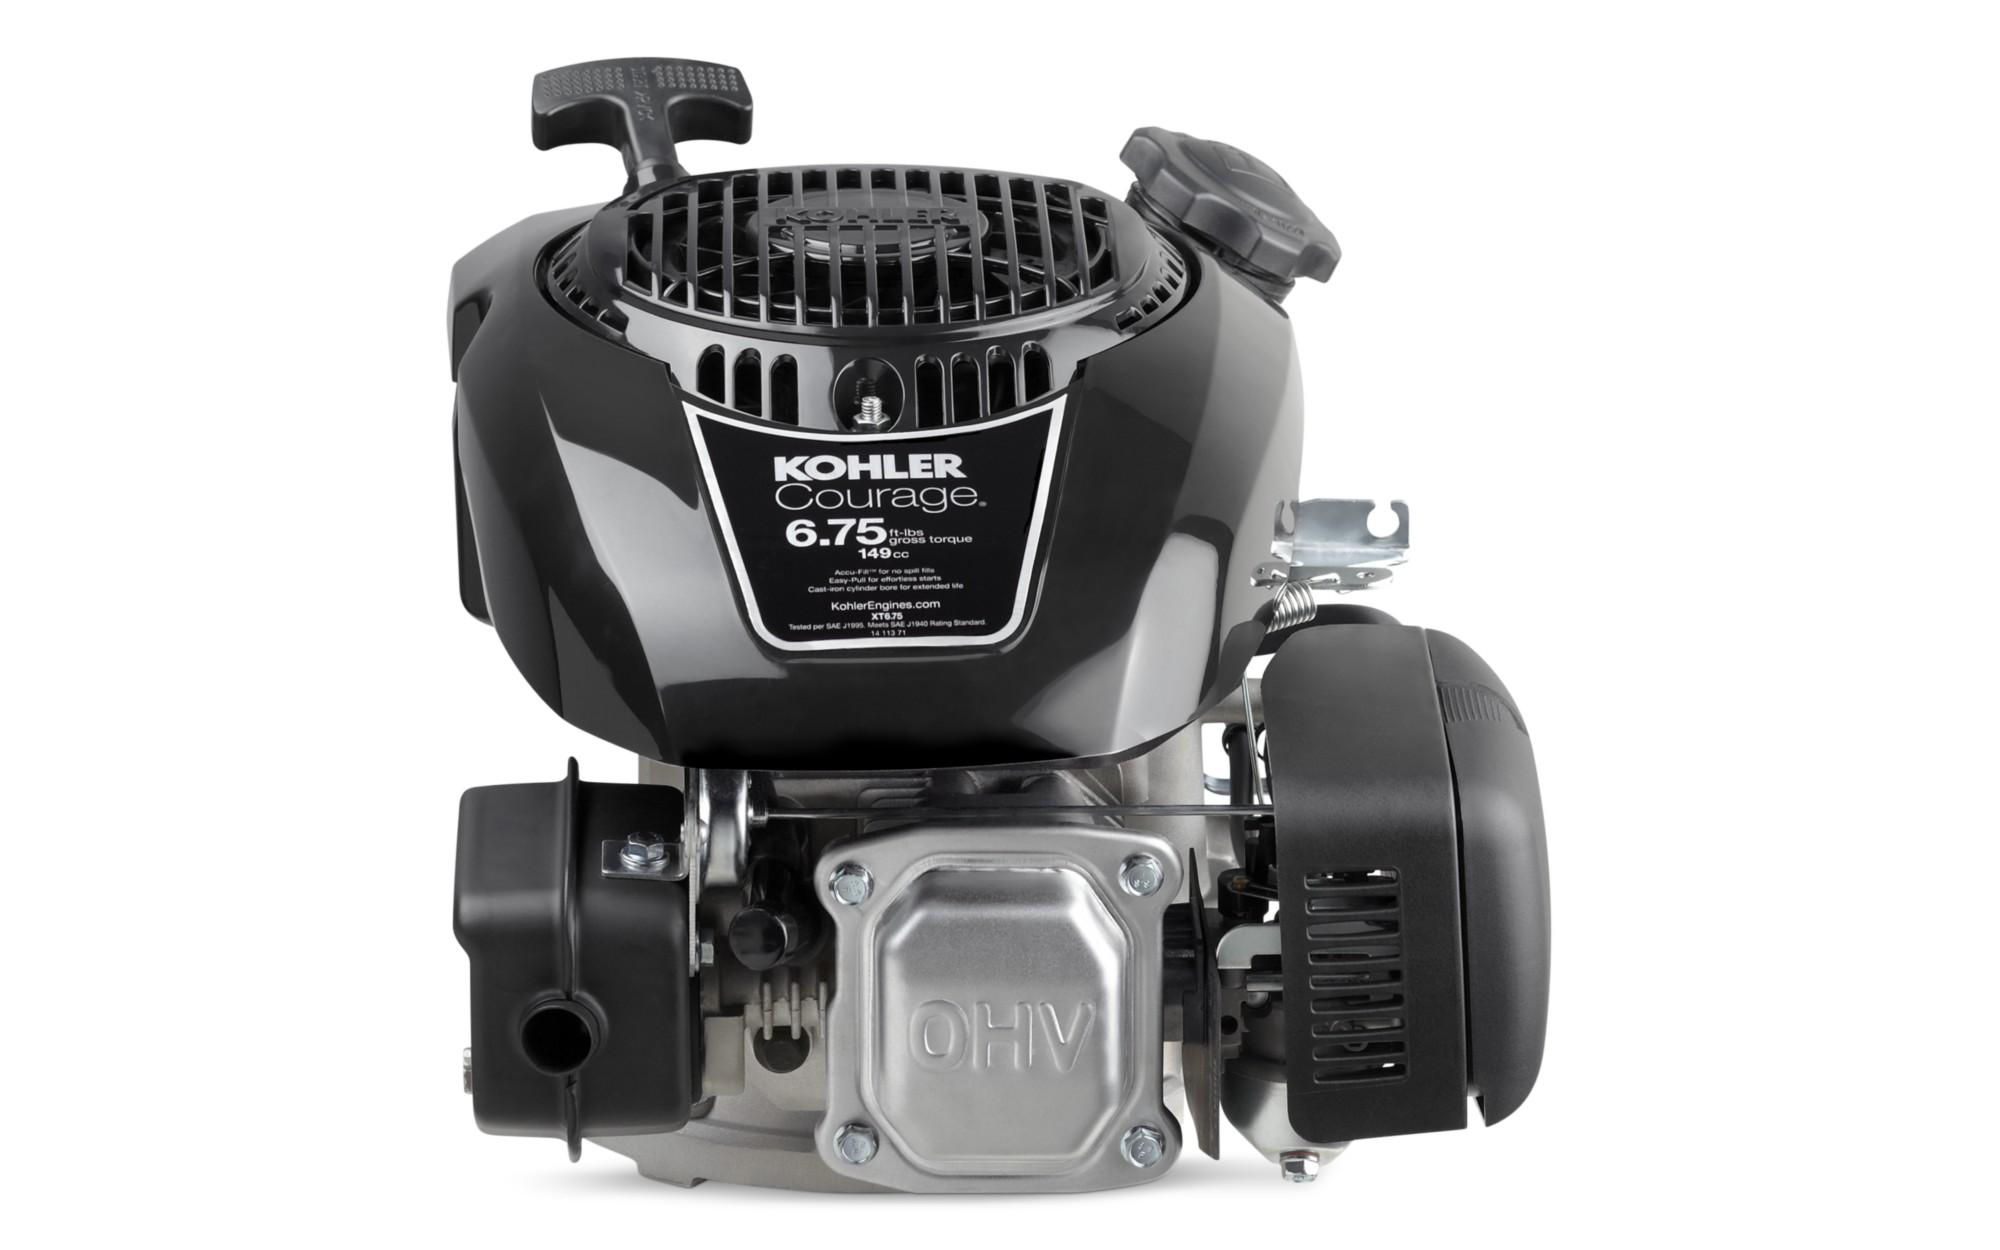 Xt675 Xt Series Kohler Engine Diagram And Parts List For Craftsman Walkbehindlawnmower Find A Dealerbuy